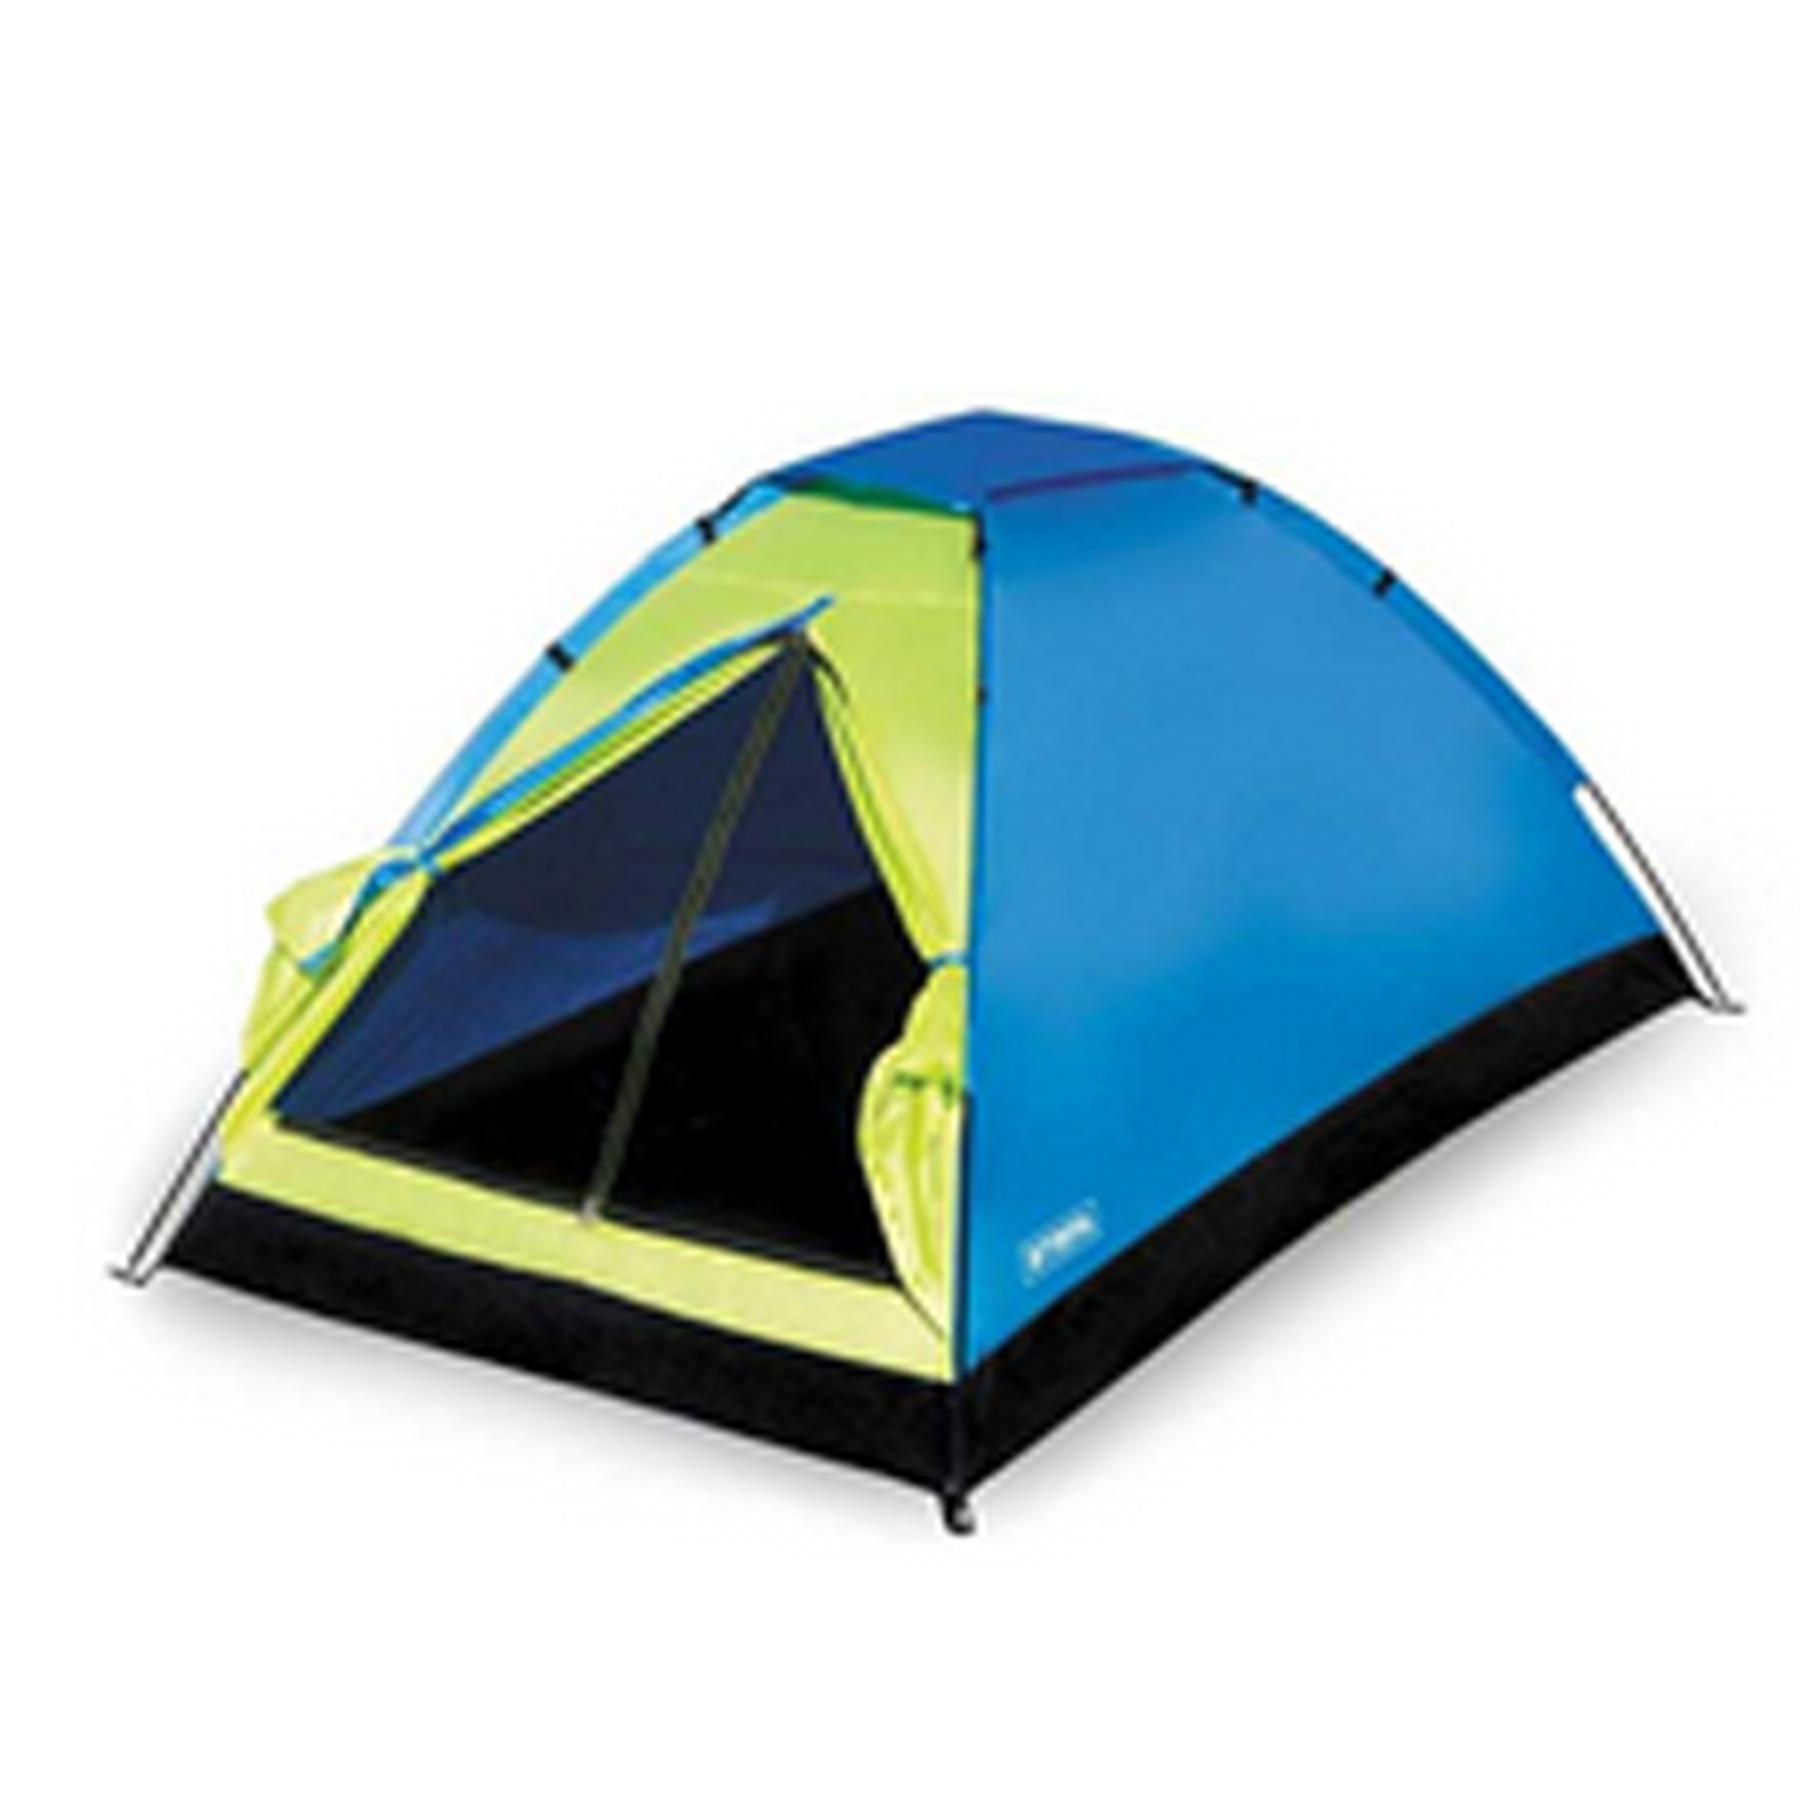 Палатка АТ NOV Sherpa 2 (1,75 кг, водост. 800 мм, 205*150см h-105см)